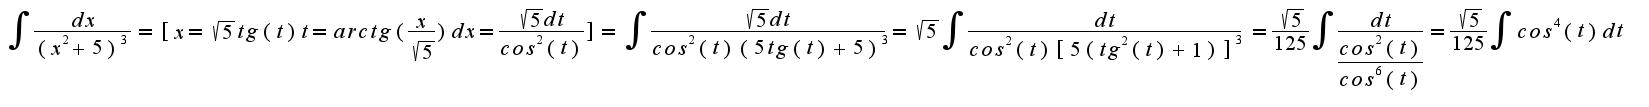 $ {\int_{}^{}{\frac{dx}{(x^2+5)^3}}} = [{x=\sqrt{5}}tg(t)       t=arctg(\frac{x}{\sqrt{5}})   dx={\frac{\sqrt{5}dt}{cos^2(t)}}] = {\int_{}^{}{\frac{\sqrt{5}dt}{cos^2(t)(5tg(t)+5)^3}}} = {\sqrt{5} {\int_{}^{}{\frac{dt}{cos^2(t)[5(tg^2(t)+1)]^3}}}} = {\frac{\sqrt{5}}{125}}{\int_{}^{}{\frac{dt}{\frac{cos^2(t)}{cos^6(t)}}}} = {\frac{\sqrt{5}}{125}}{\int_{}^{}{cos^4(t)dt}}$